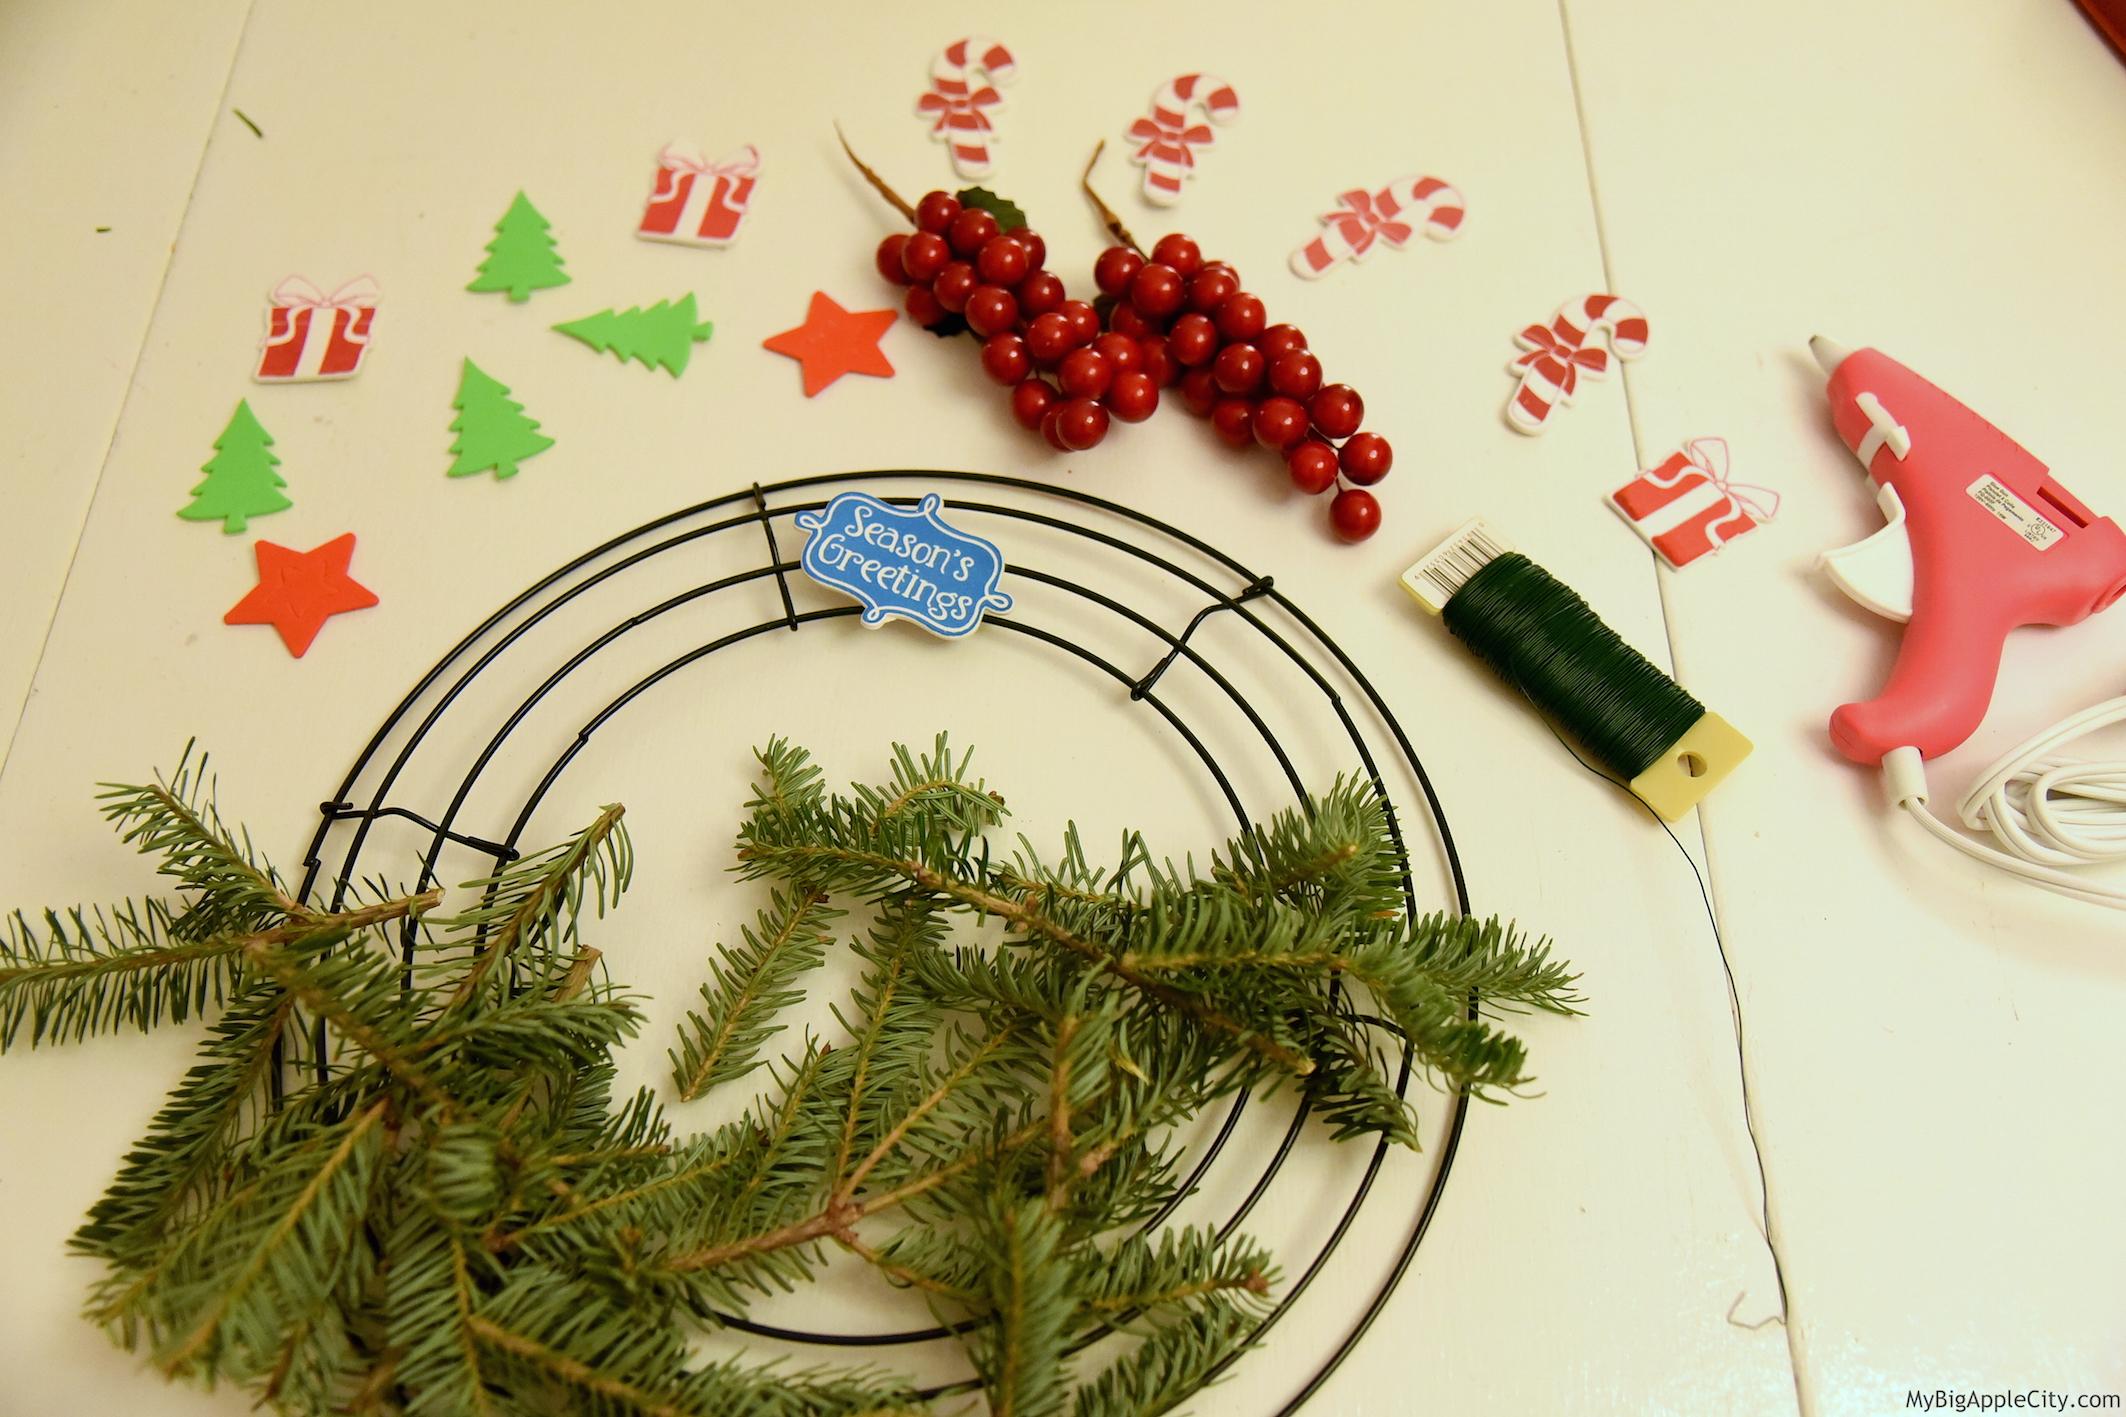 DIY-Christmas-Wreath-Lifestyle-Blogger-NYC-MyBigAppleCity